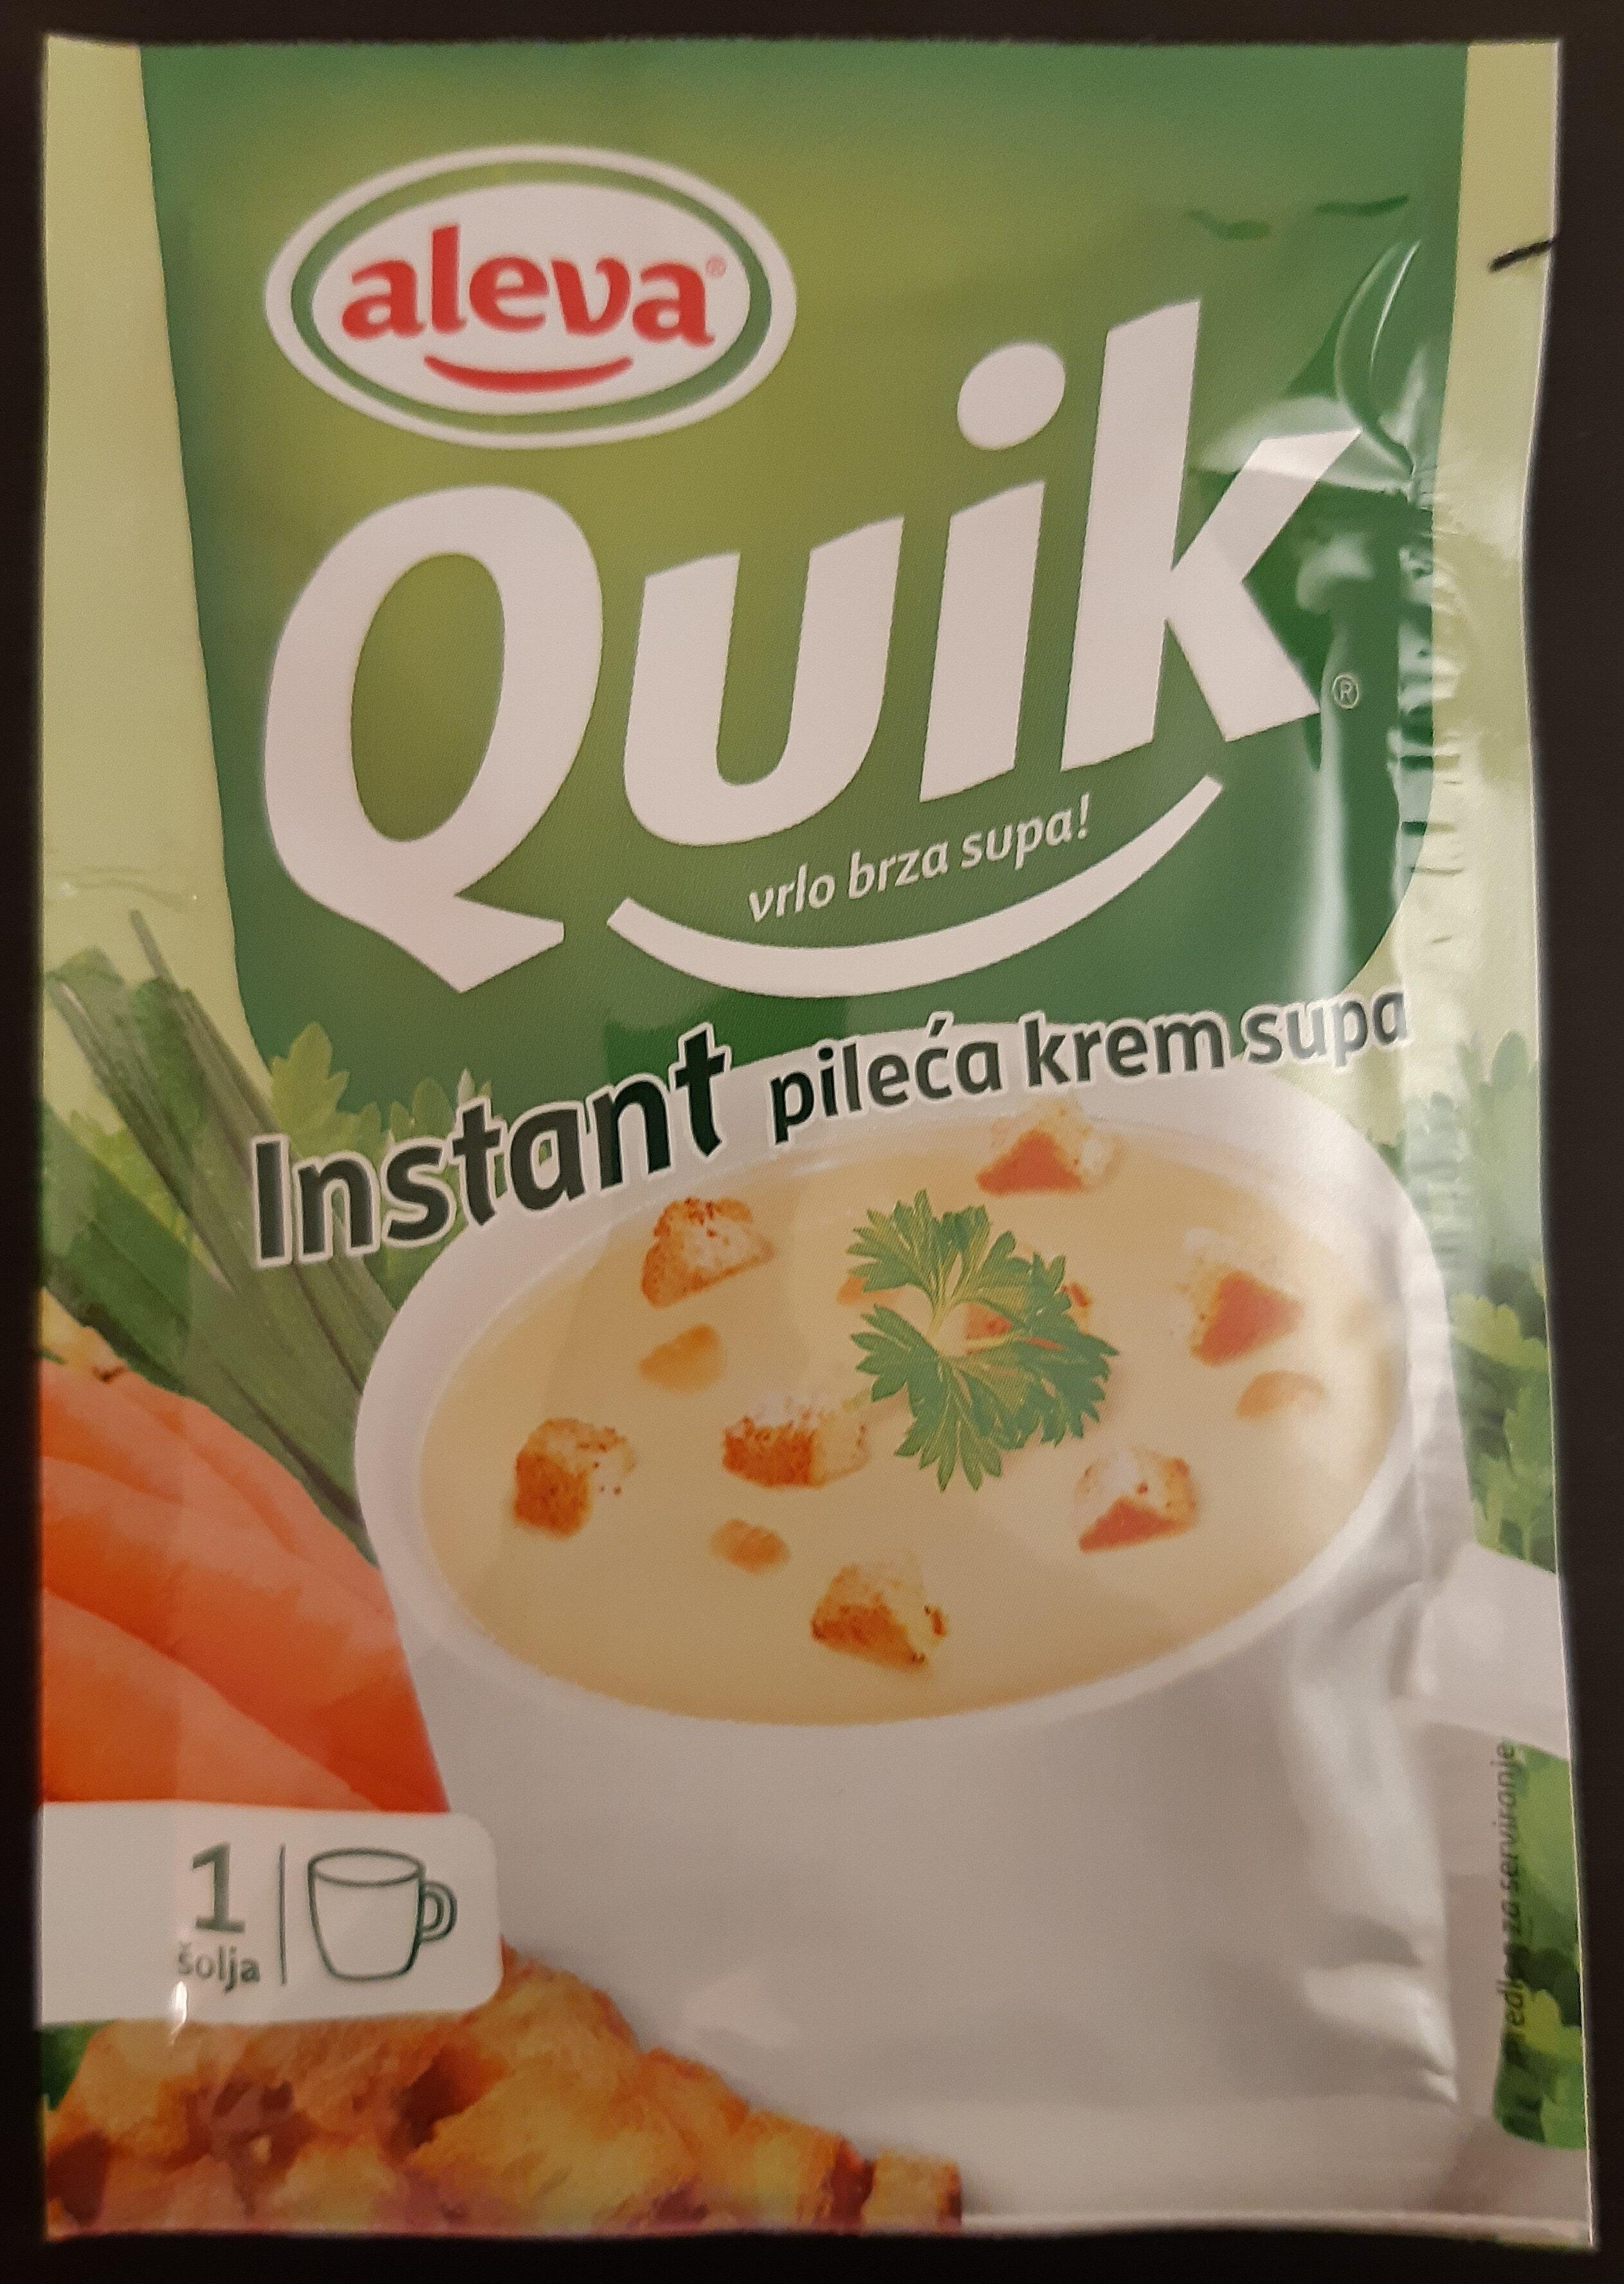 Quik instant pileća supa - Product - sr